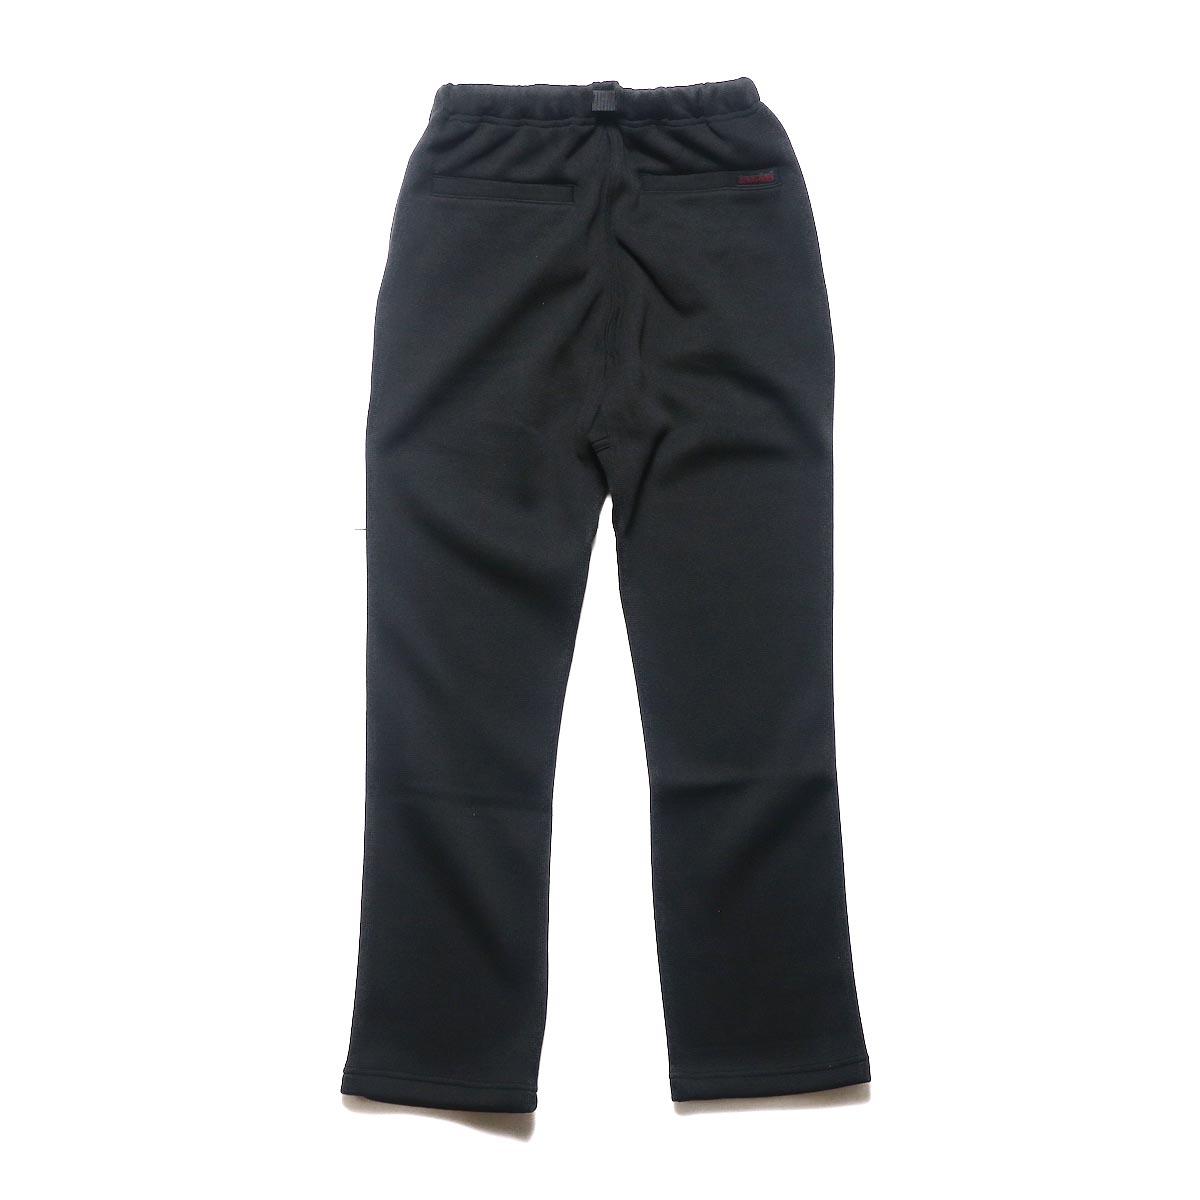 GRAMICCI / BONDING KNIT FLEECE NN-PANTS JUST CUT (Black)背面